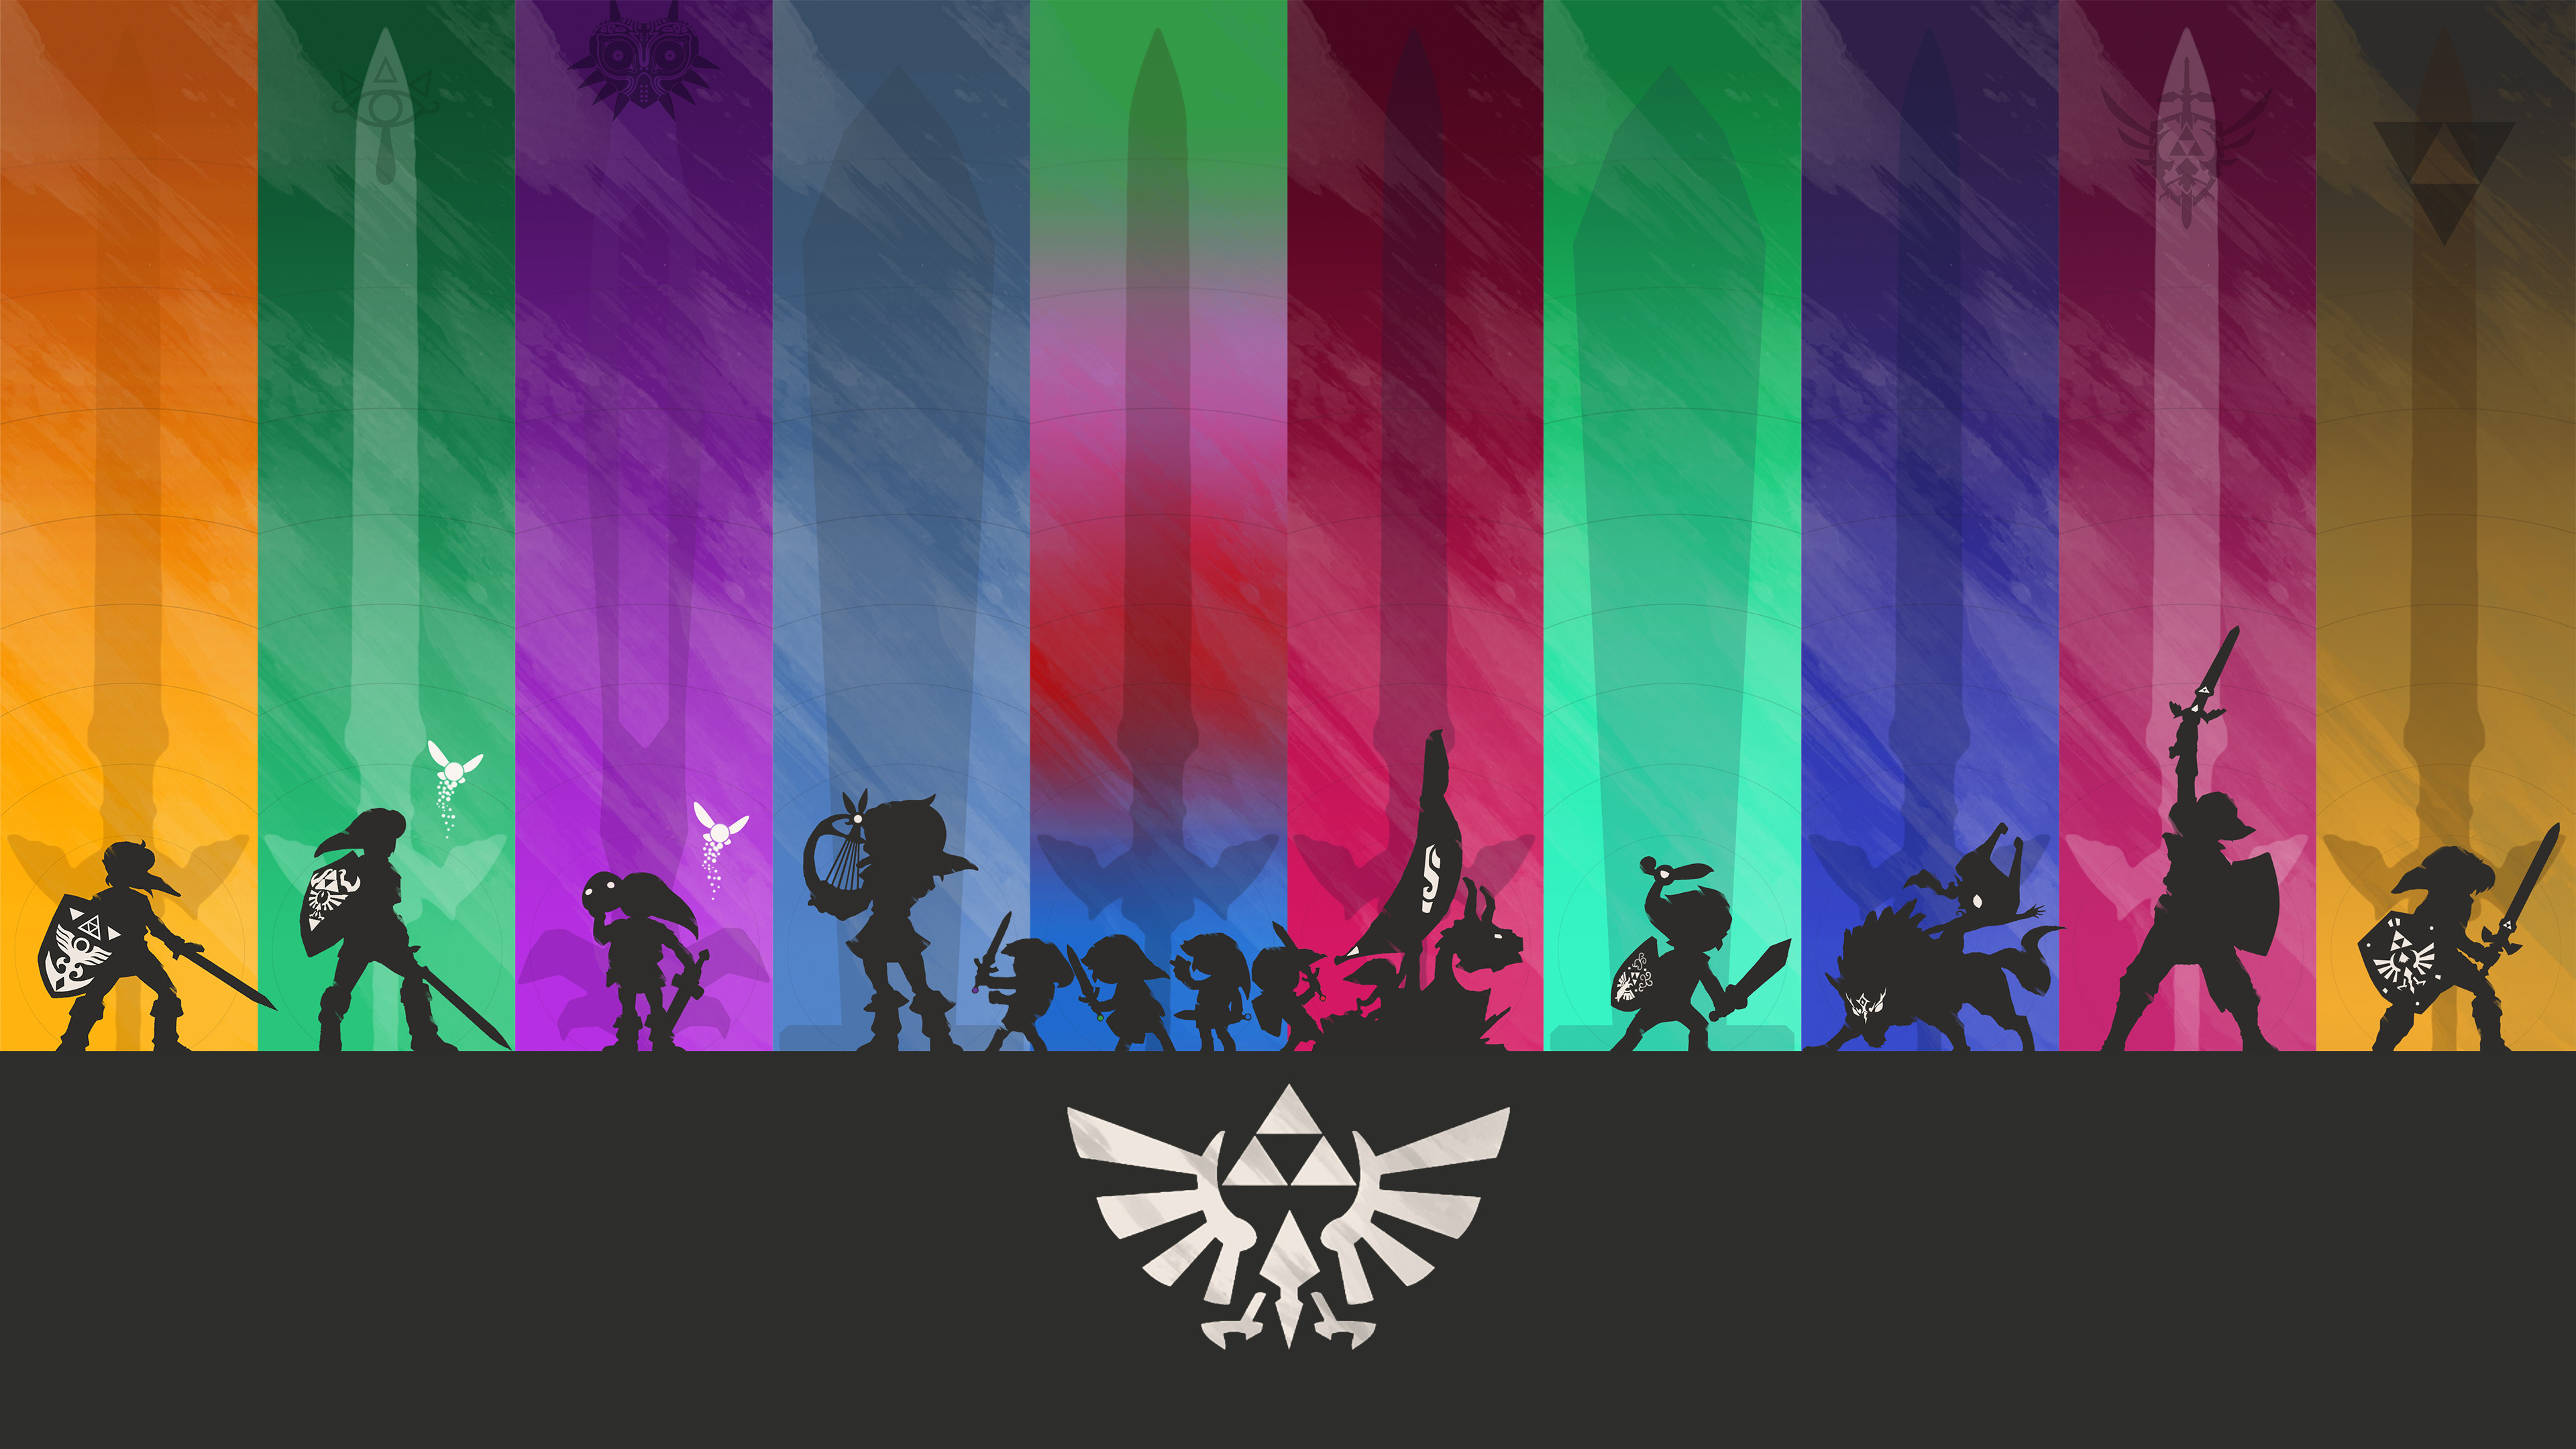 … Minimalistic Legend of Zelda Wallpaper (4K) by henrikpw